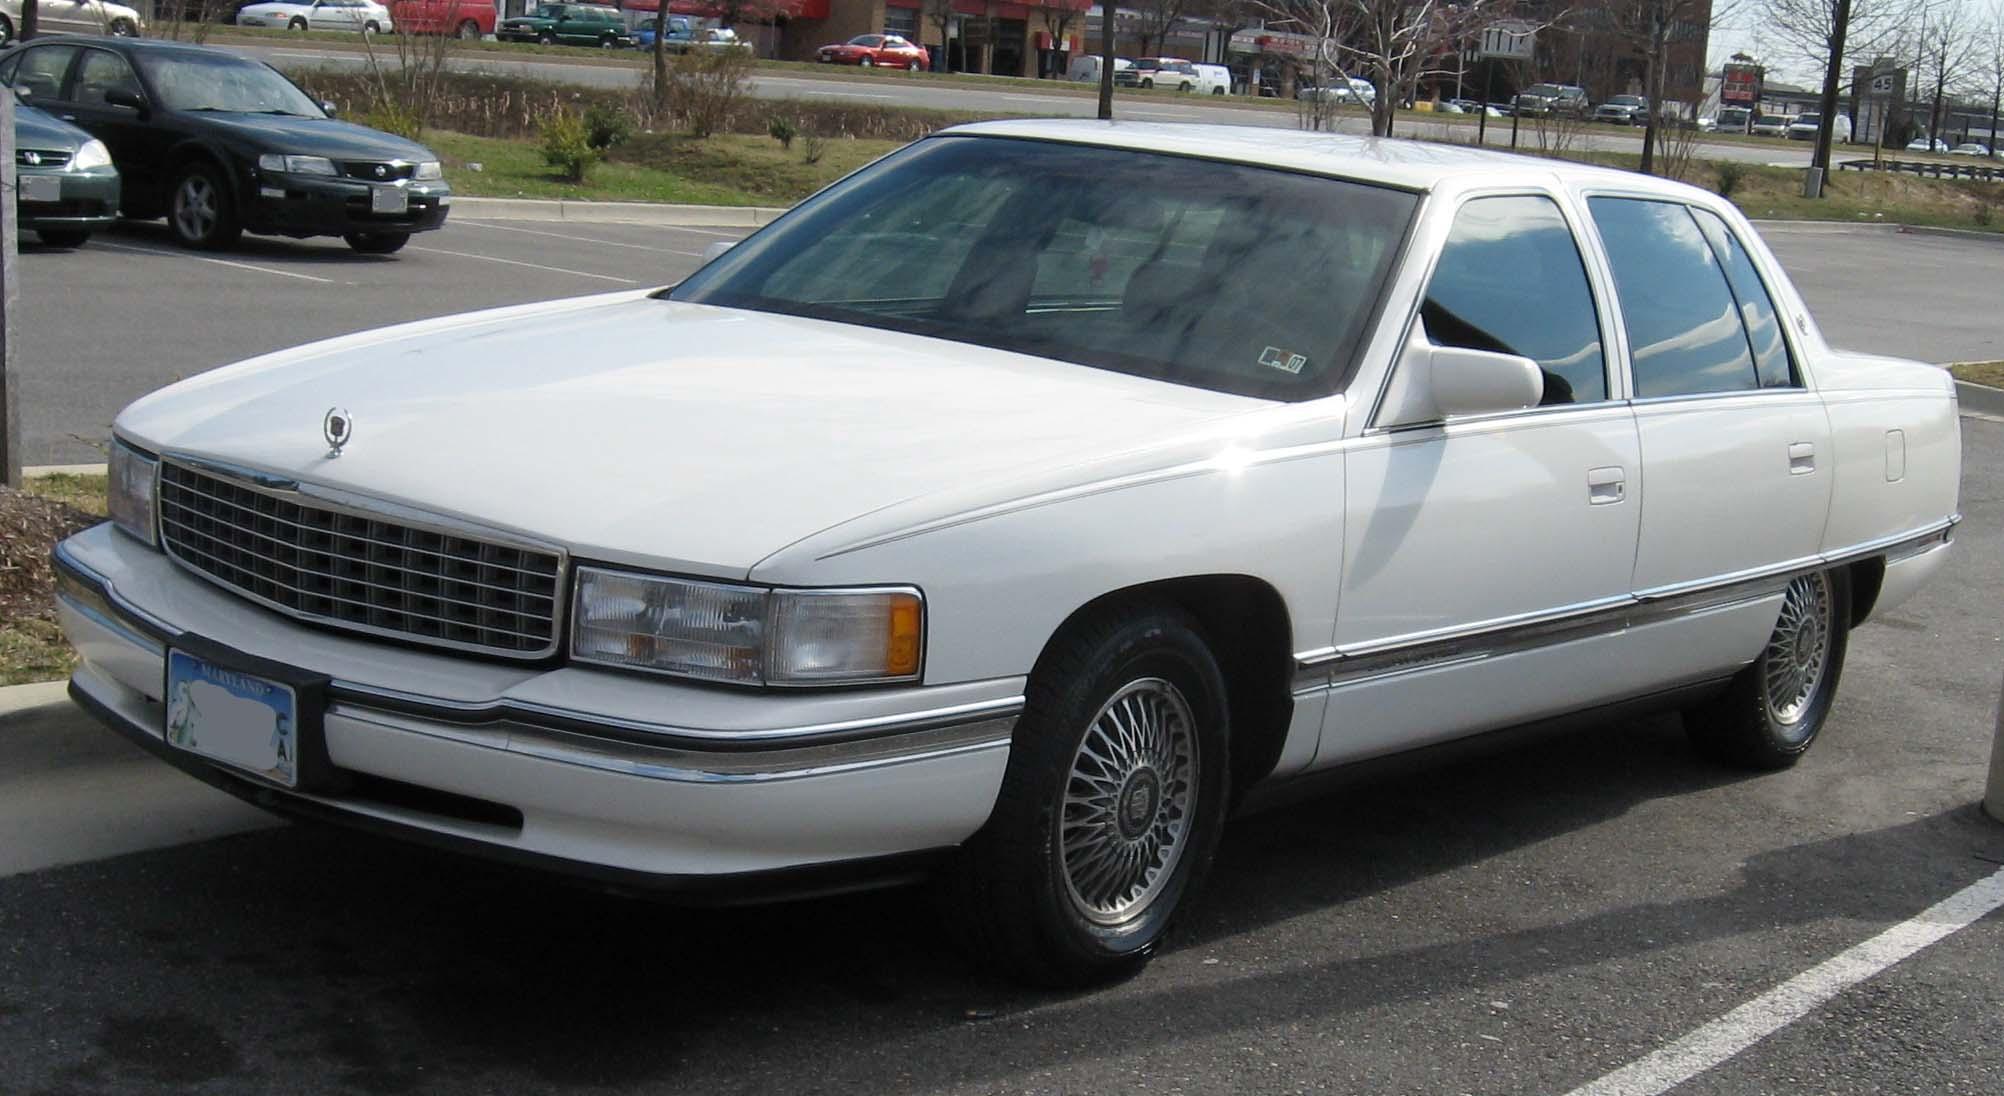 File:94-99 Cadillac Deville.jpg - Wikimedia Commons